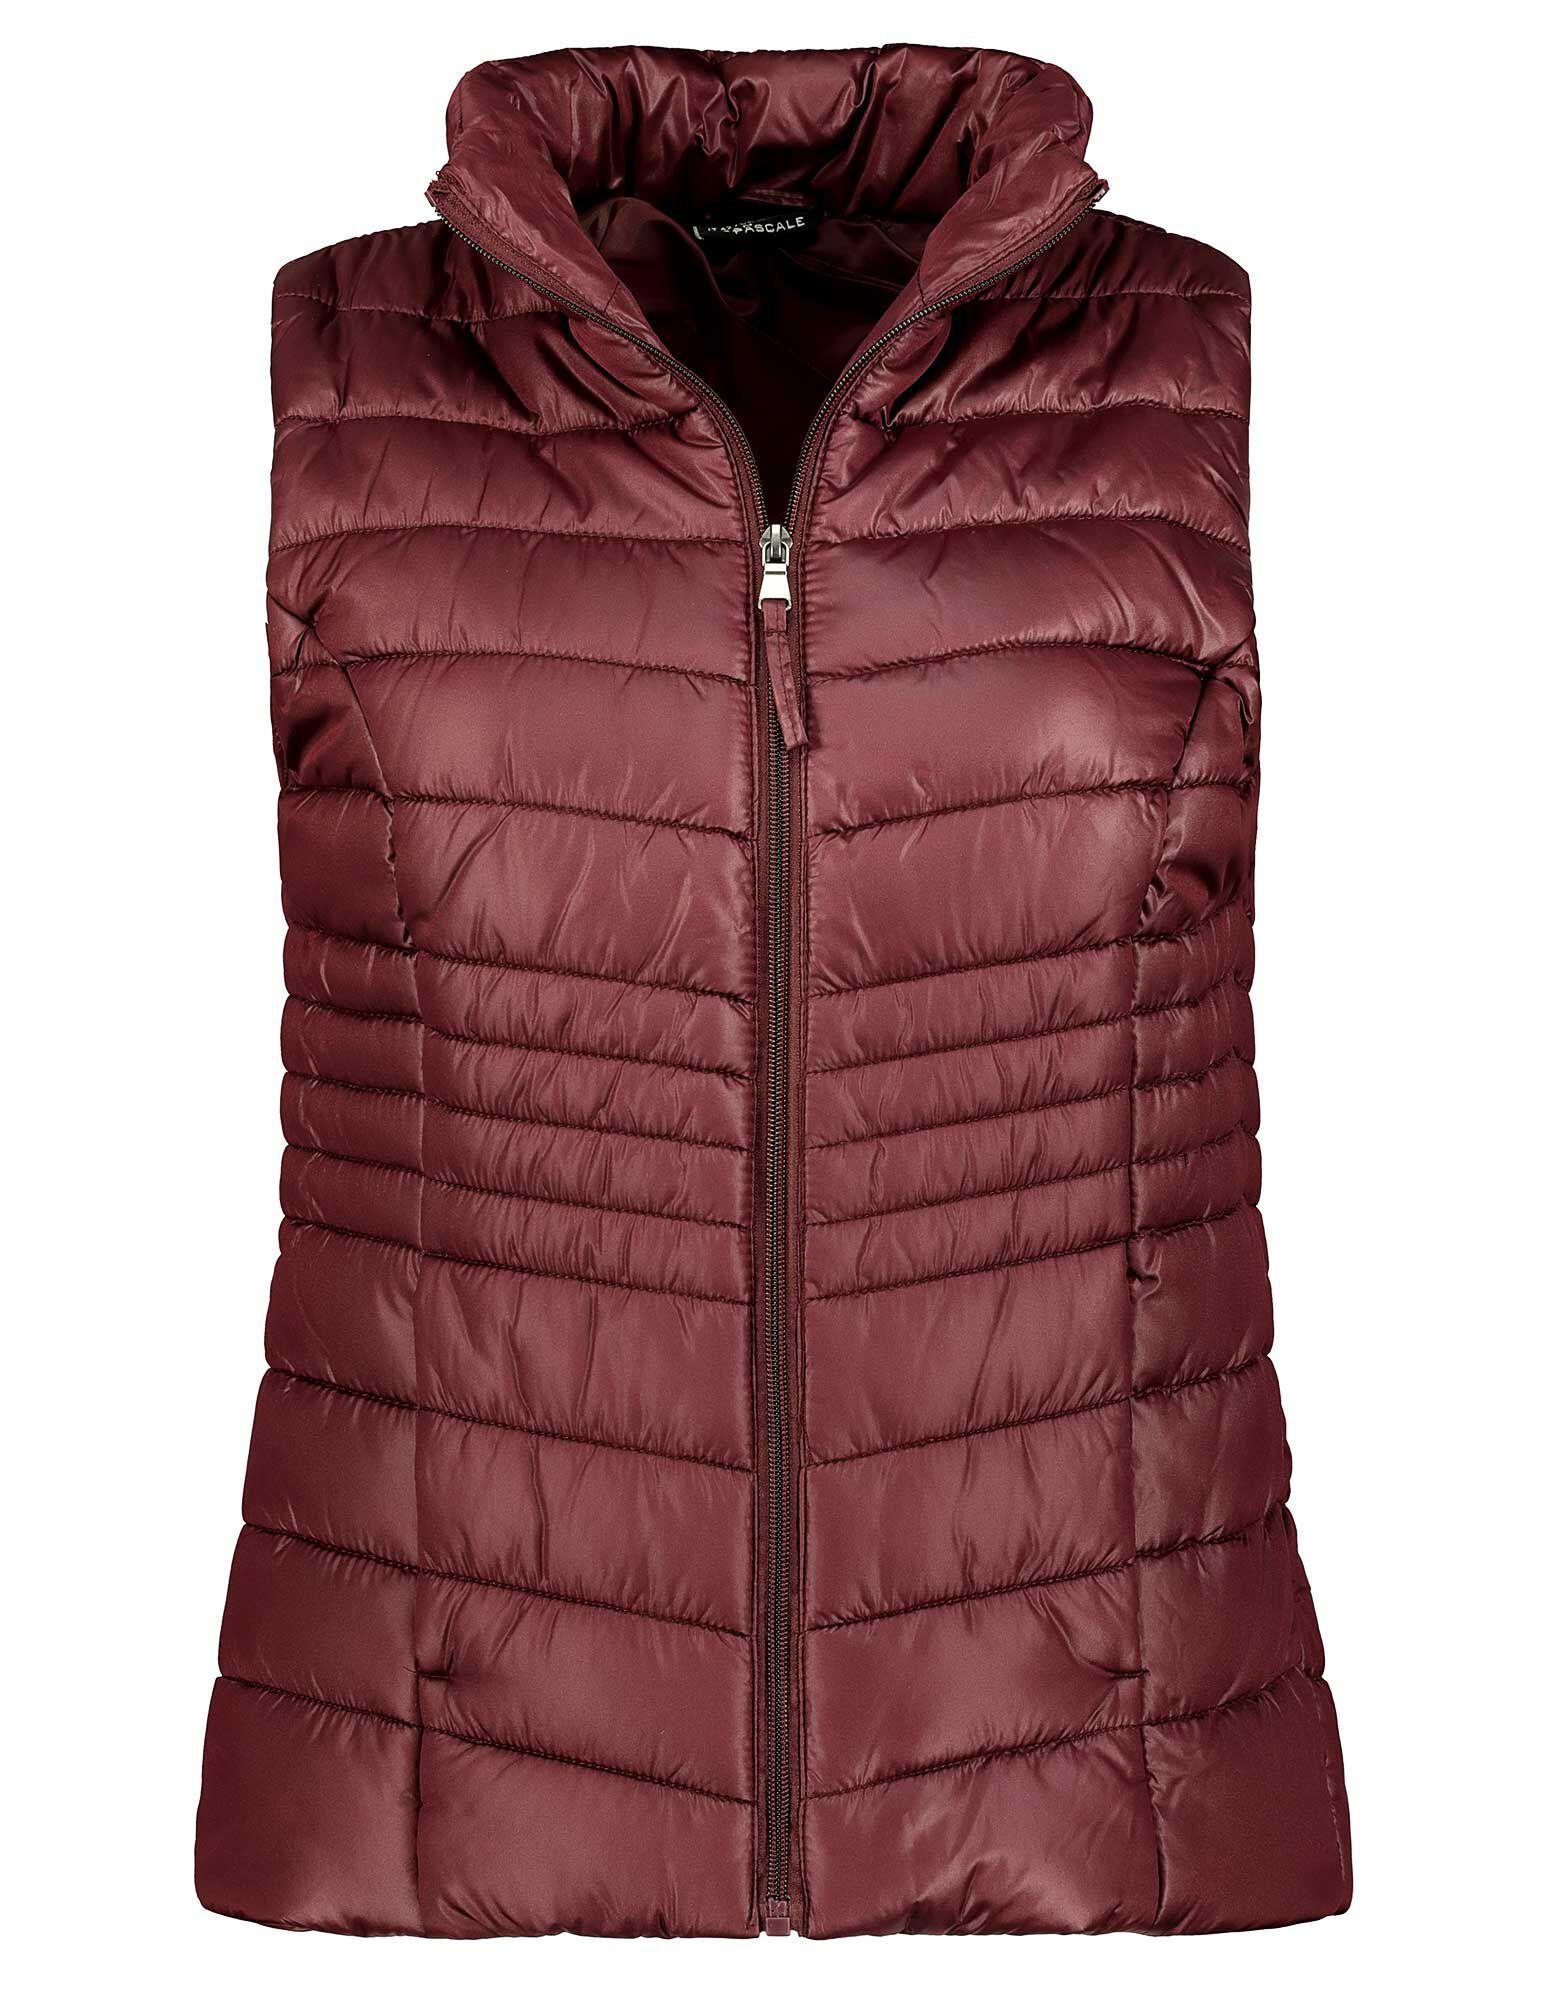 takko mode winter jacken mantel gr.50 damen